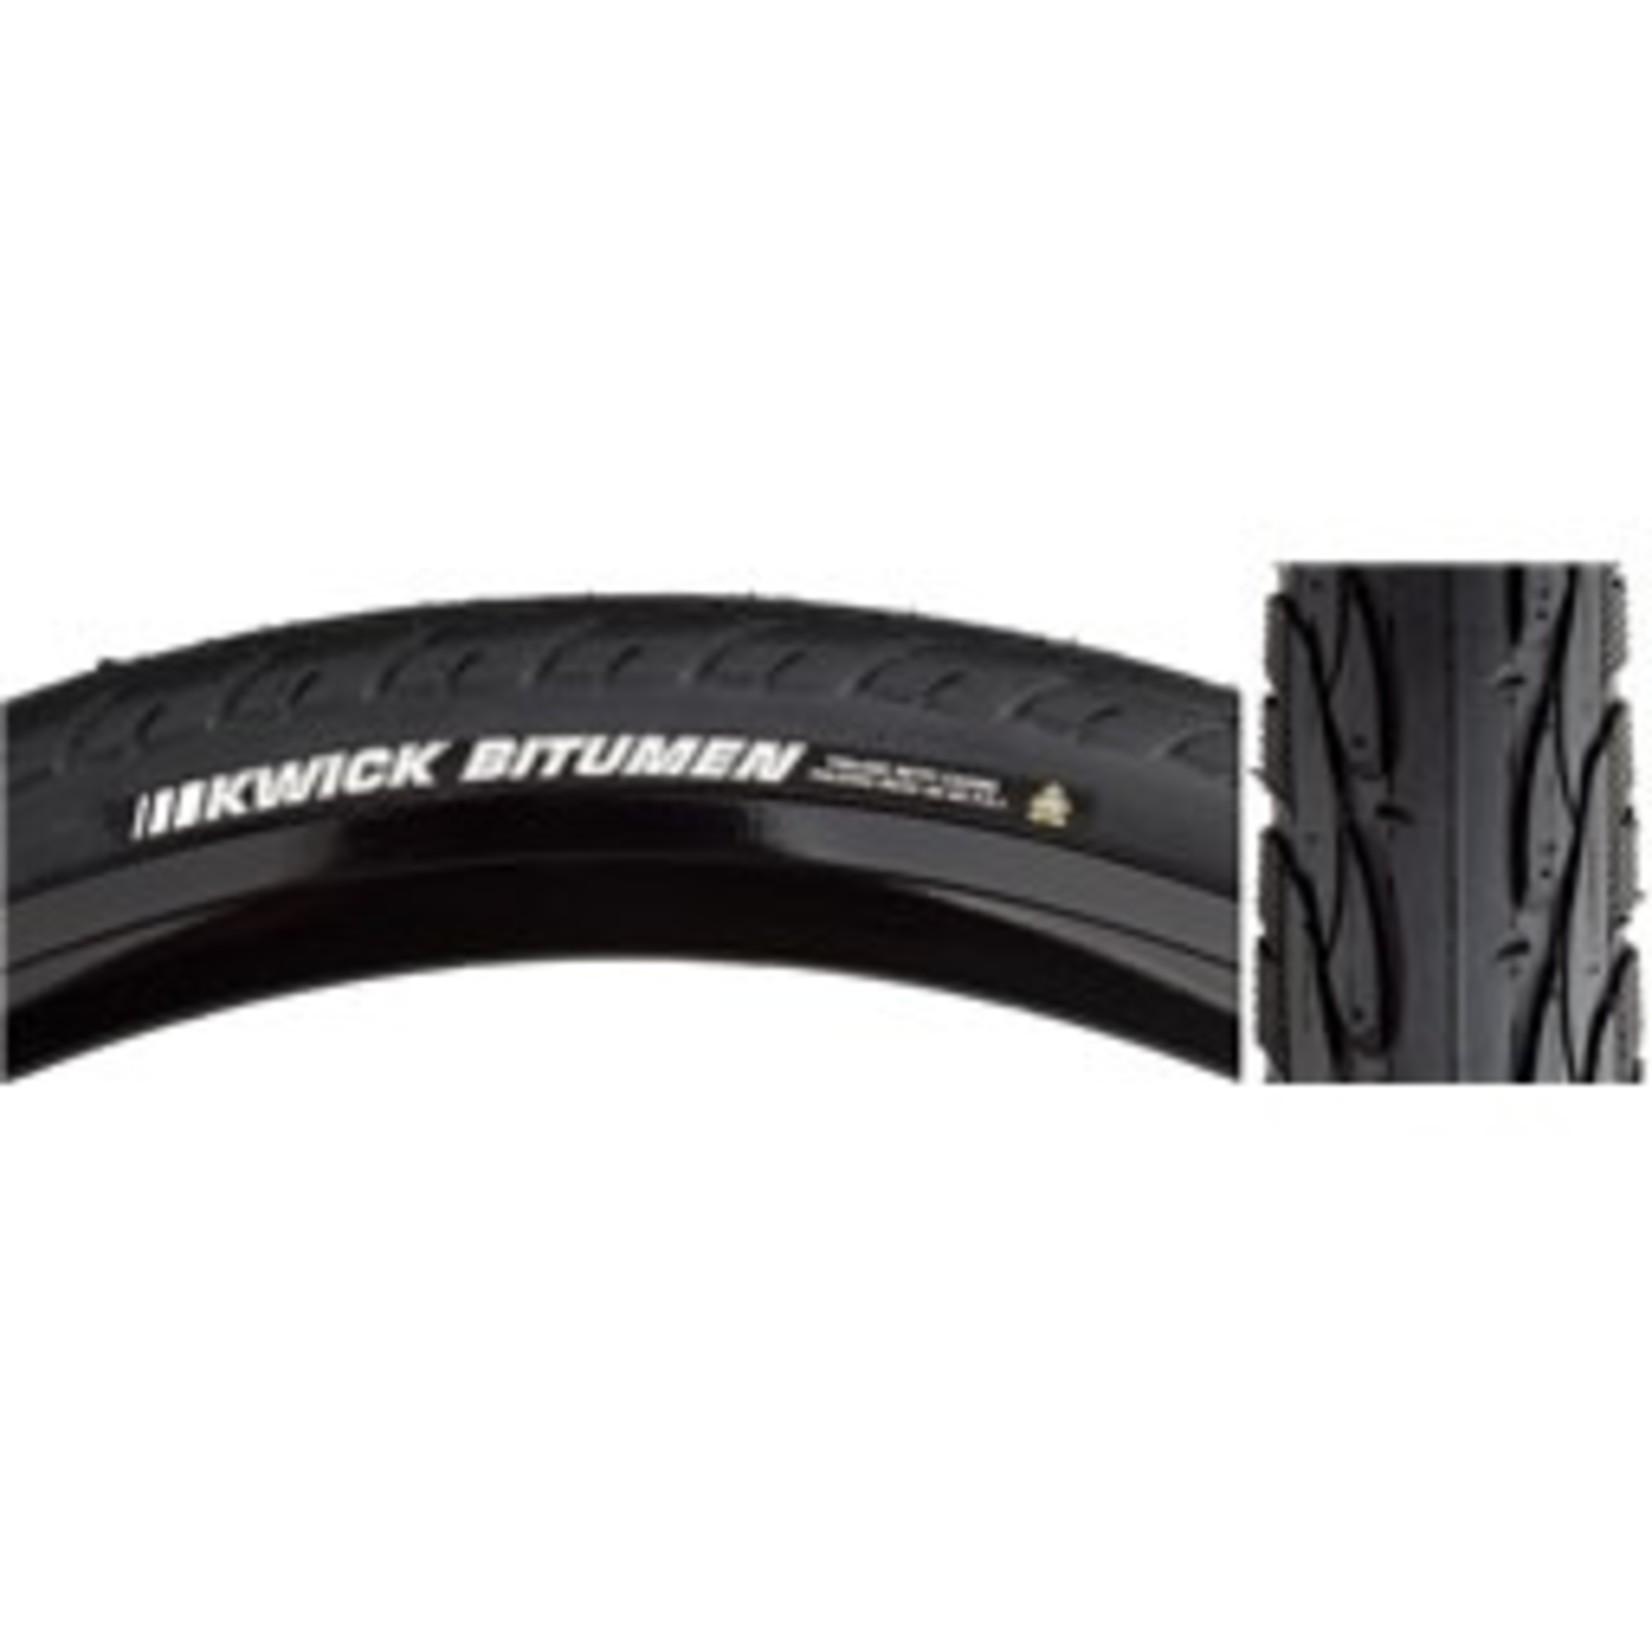 Kwick Bitumen Elite 700 x 45 Folding Bead Black